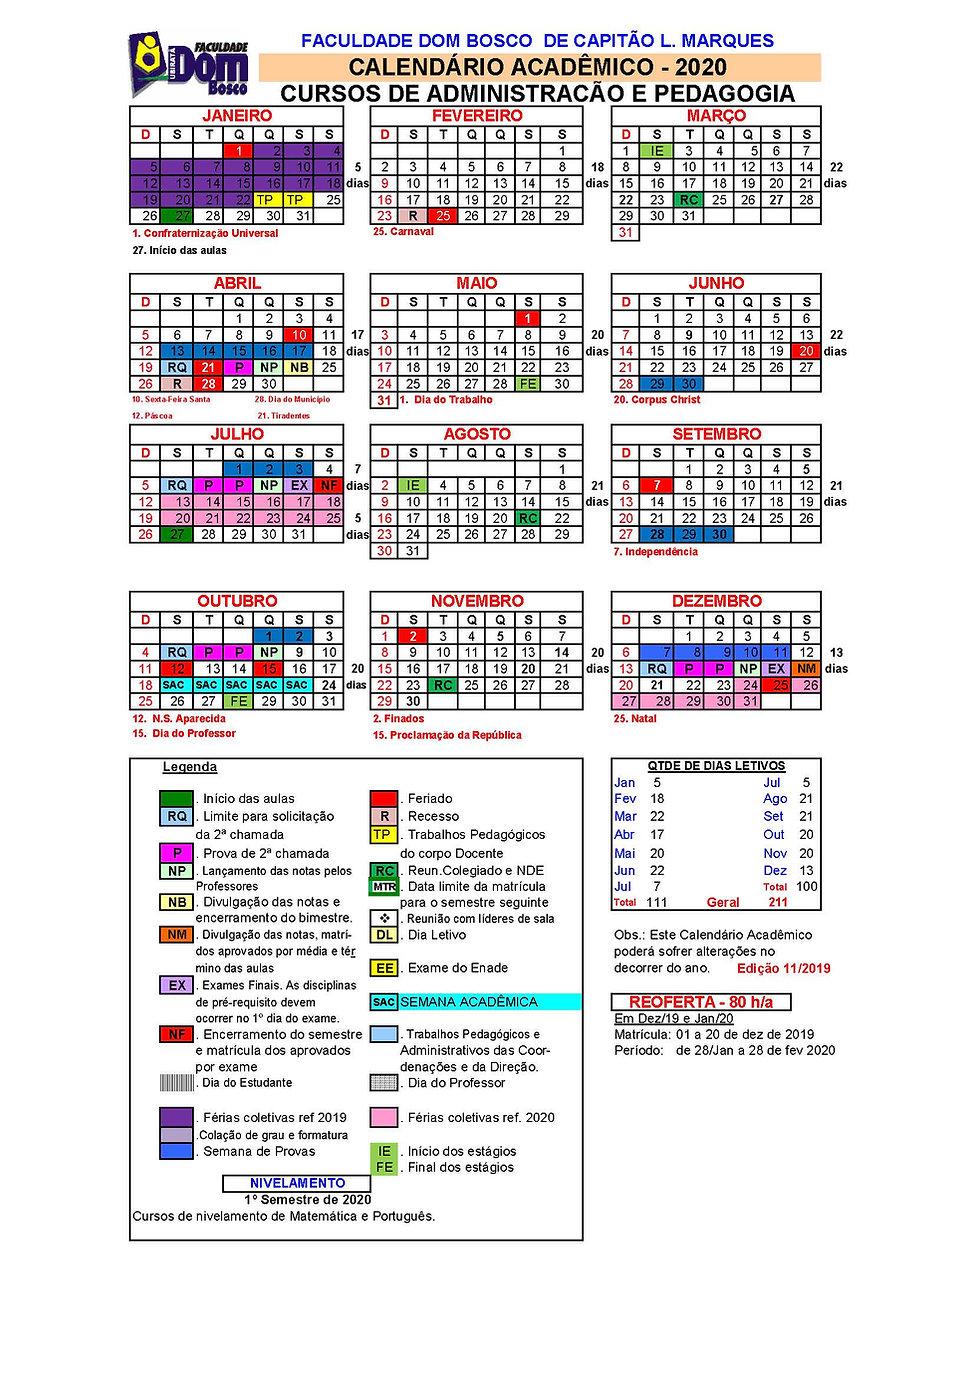 Calendario Academico 2020 Cap Leo Marque